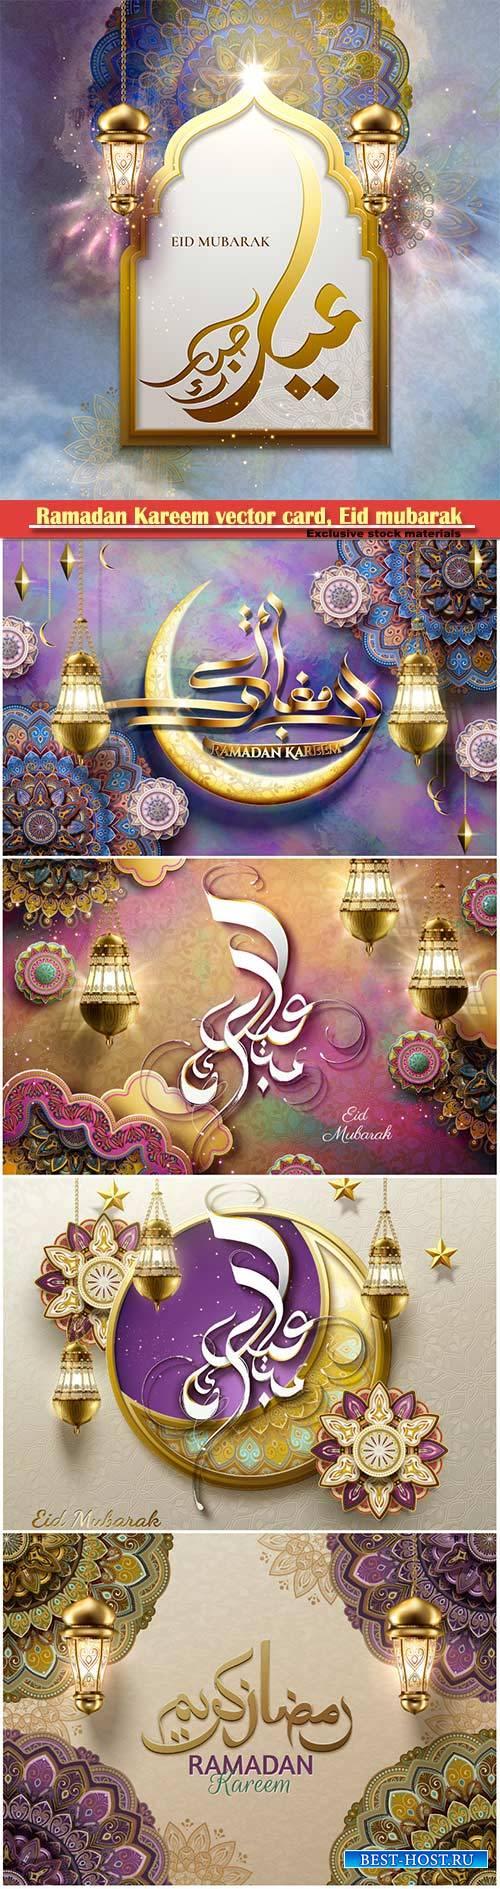 Ramadan Kareem vector card, Eid mubarak calligraphy design templates # 11